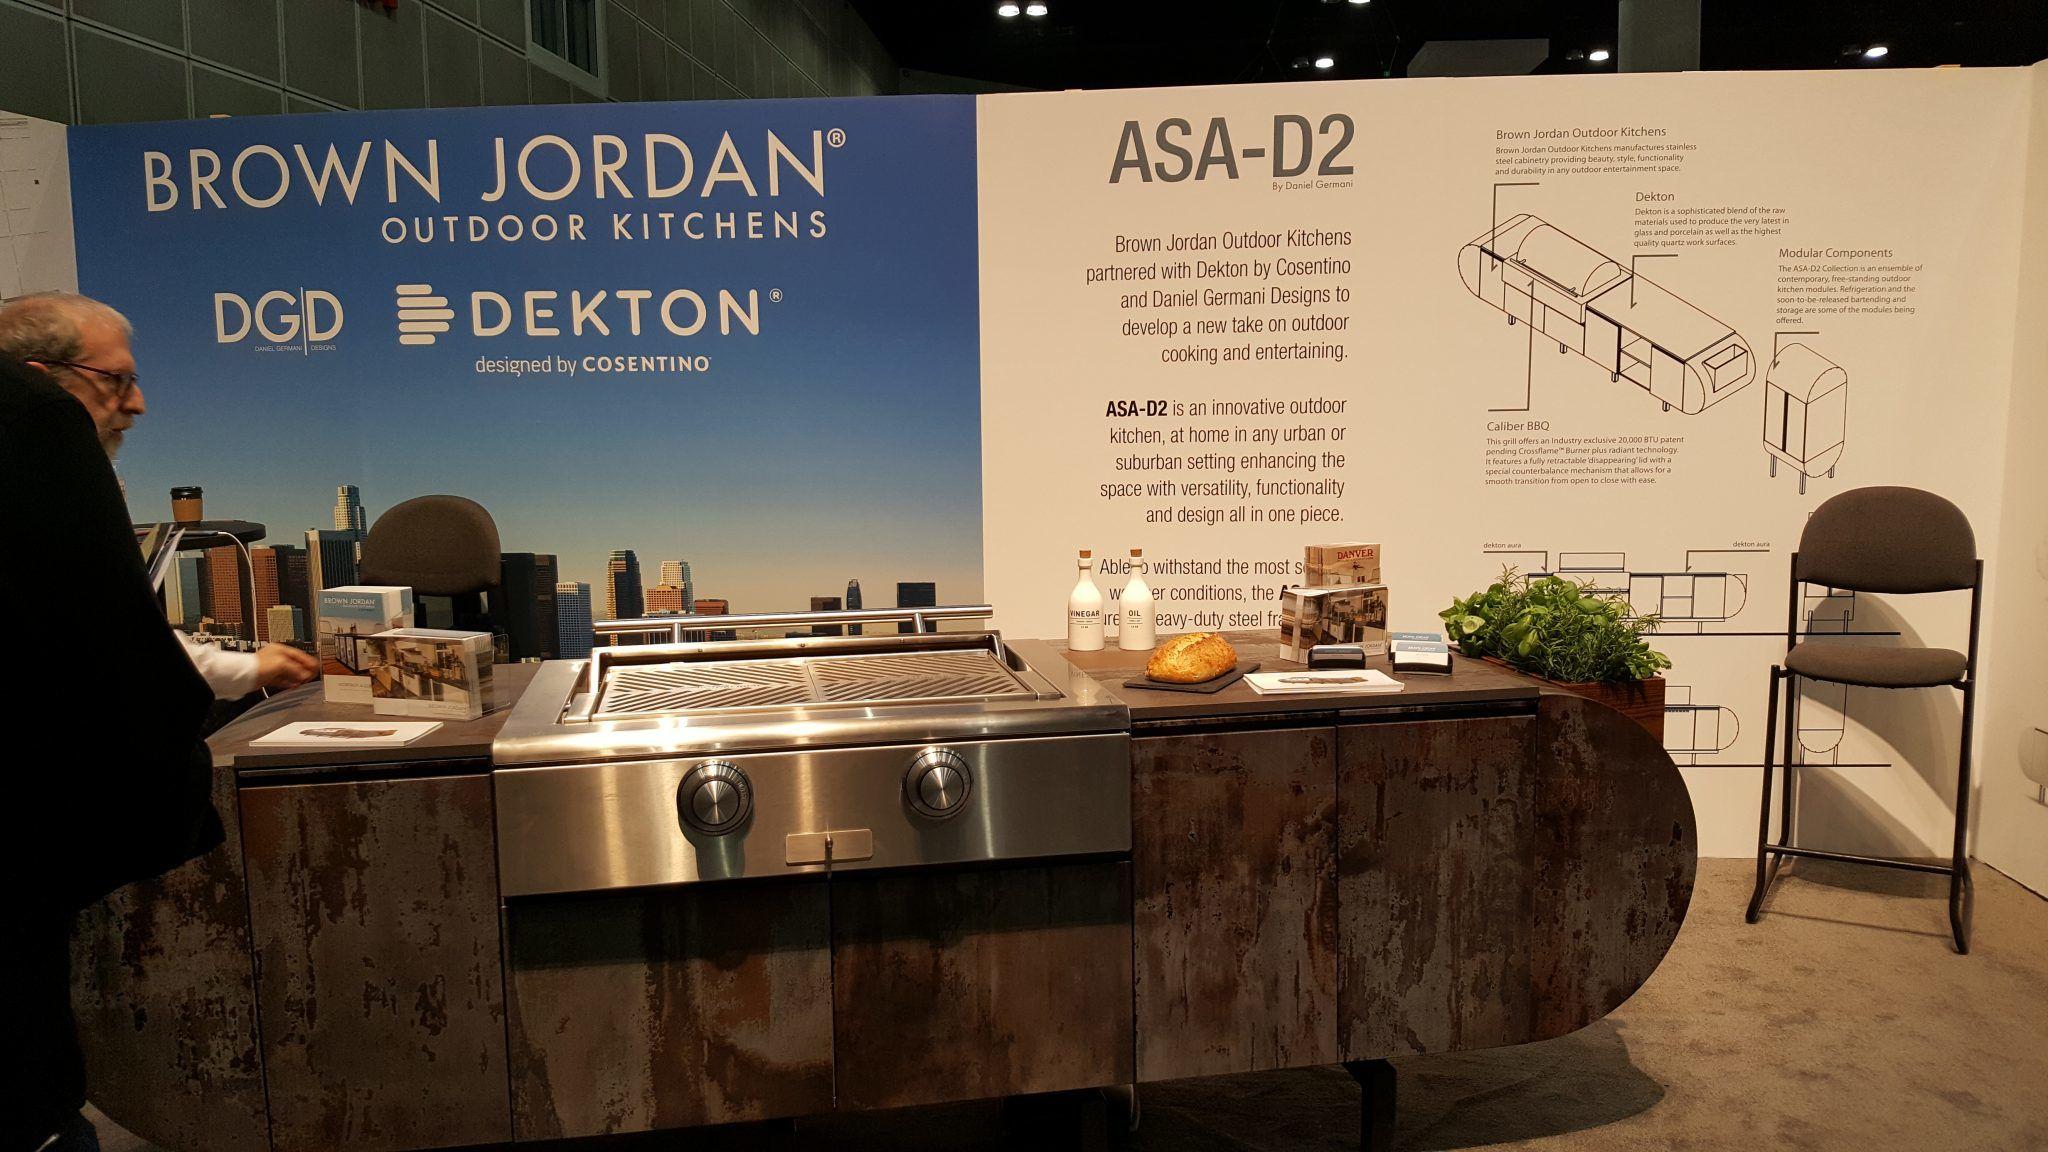 brown-jordan-stainless-steel-outdoor-kitchen-1-dwell-on-design-2018-los-angeles